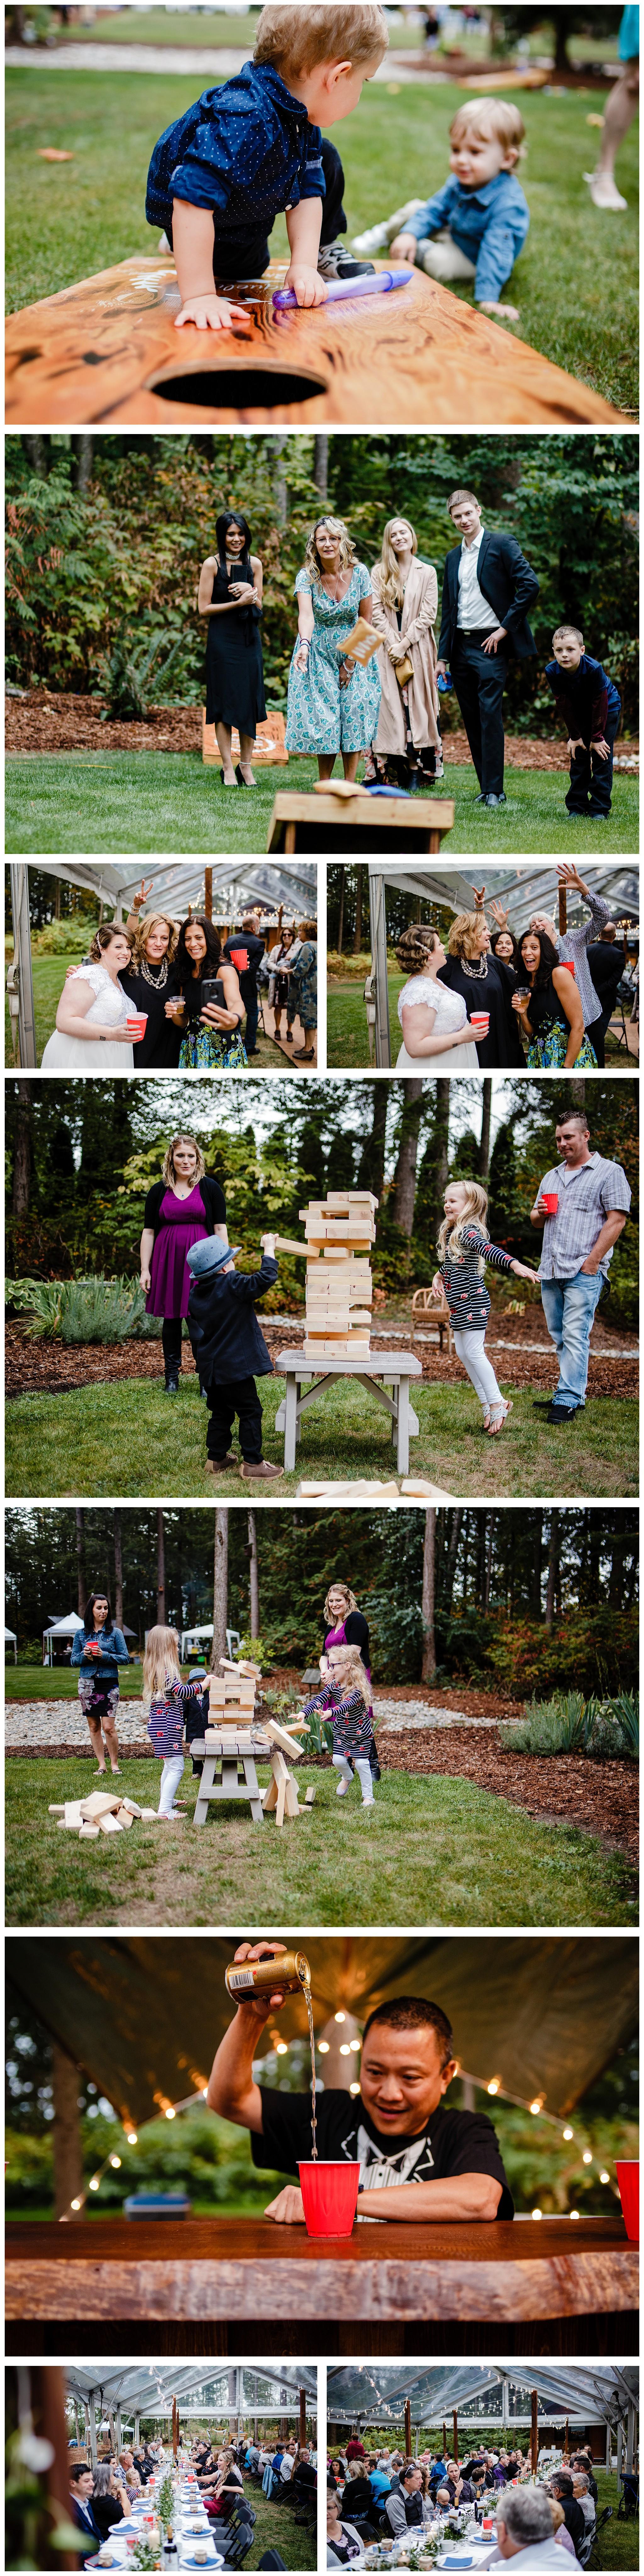 Aldergrove Park Fall Backyard Wedding Photographer Pregnant Bride Tent Outdoor BC Canada Best Wedding Photographer_0044.jpg